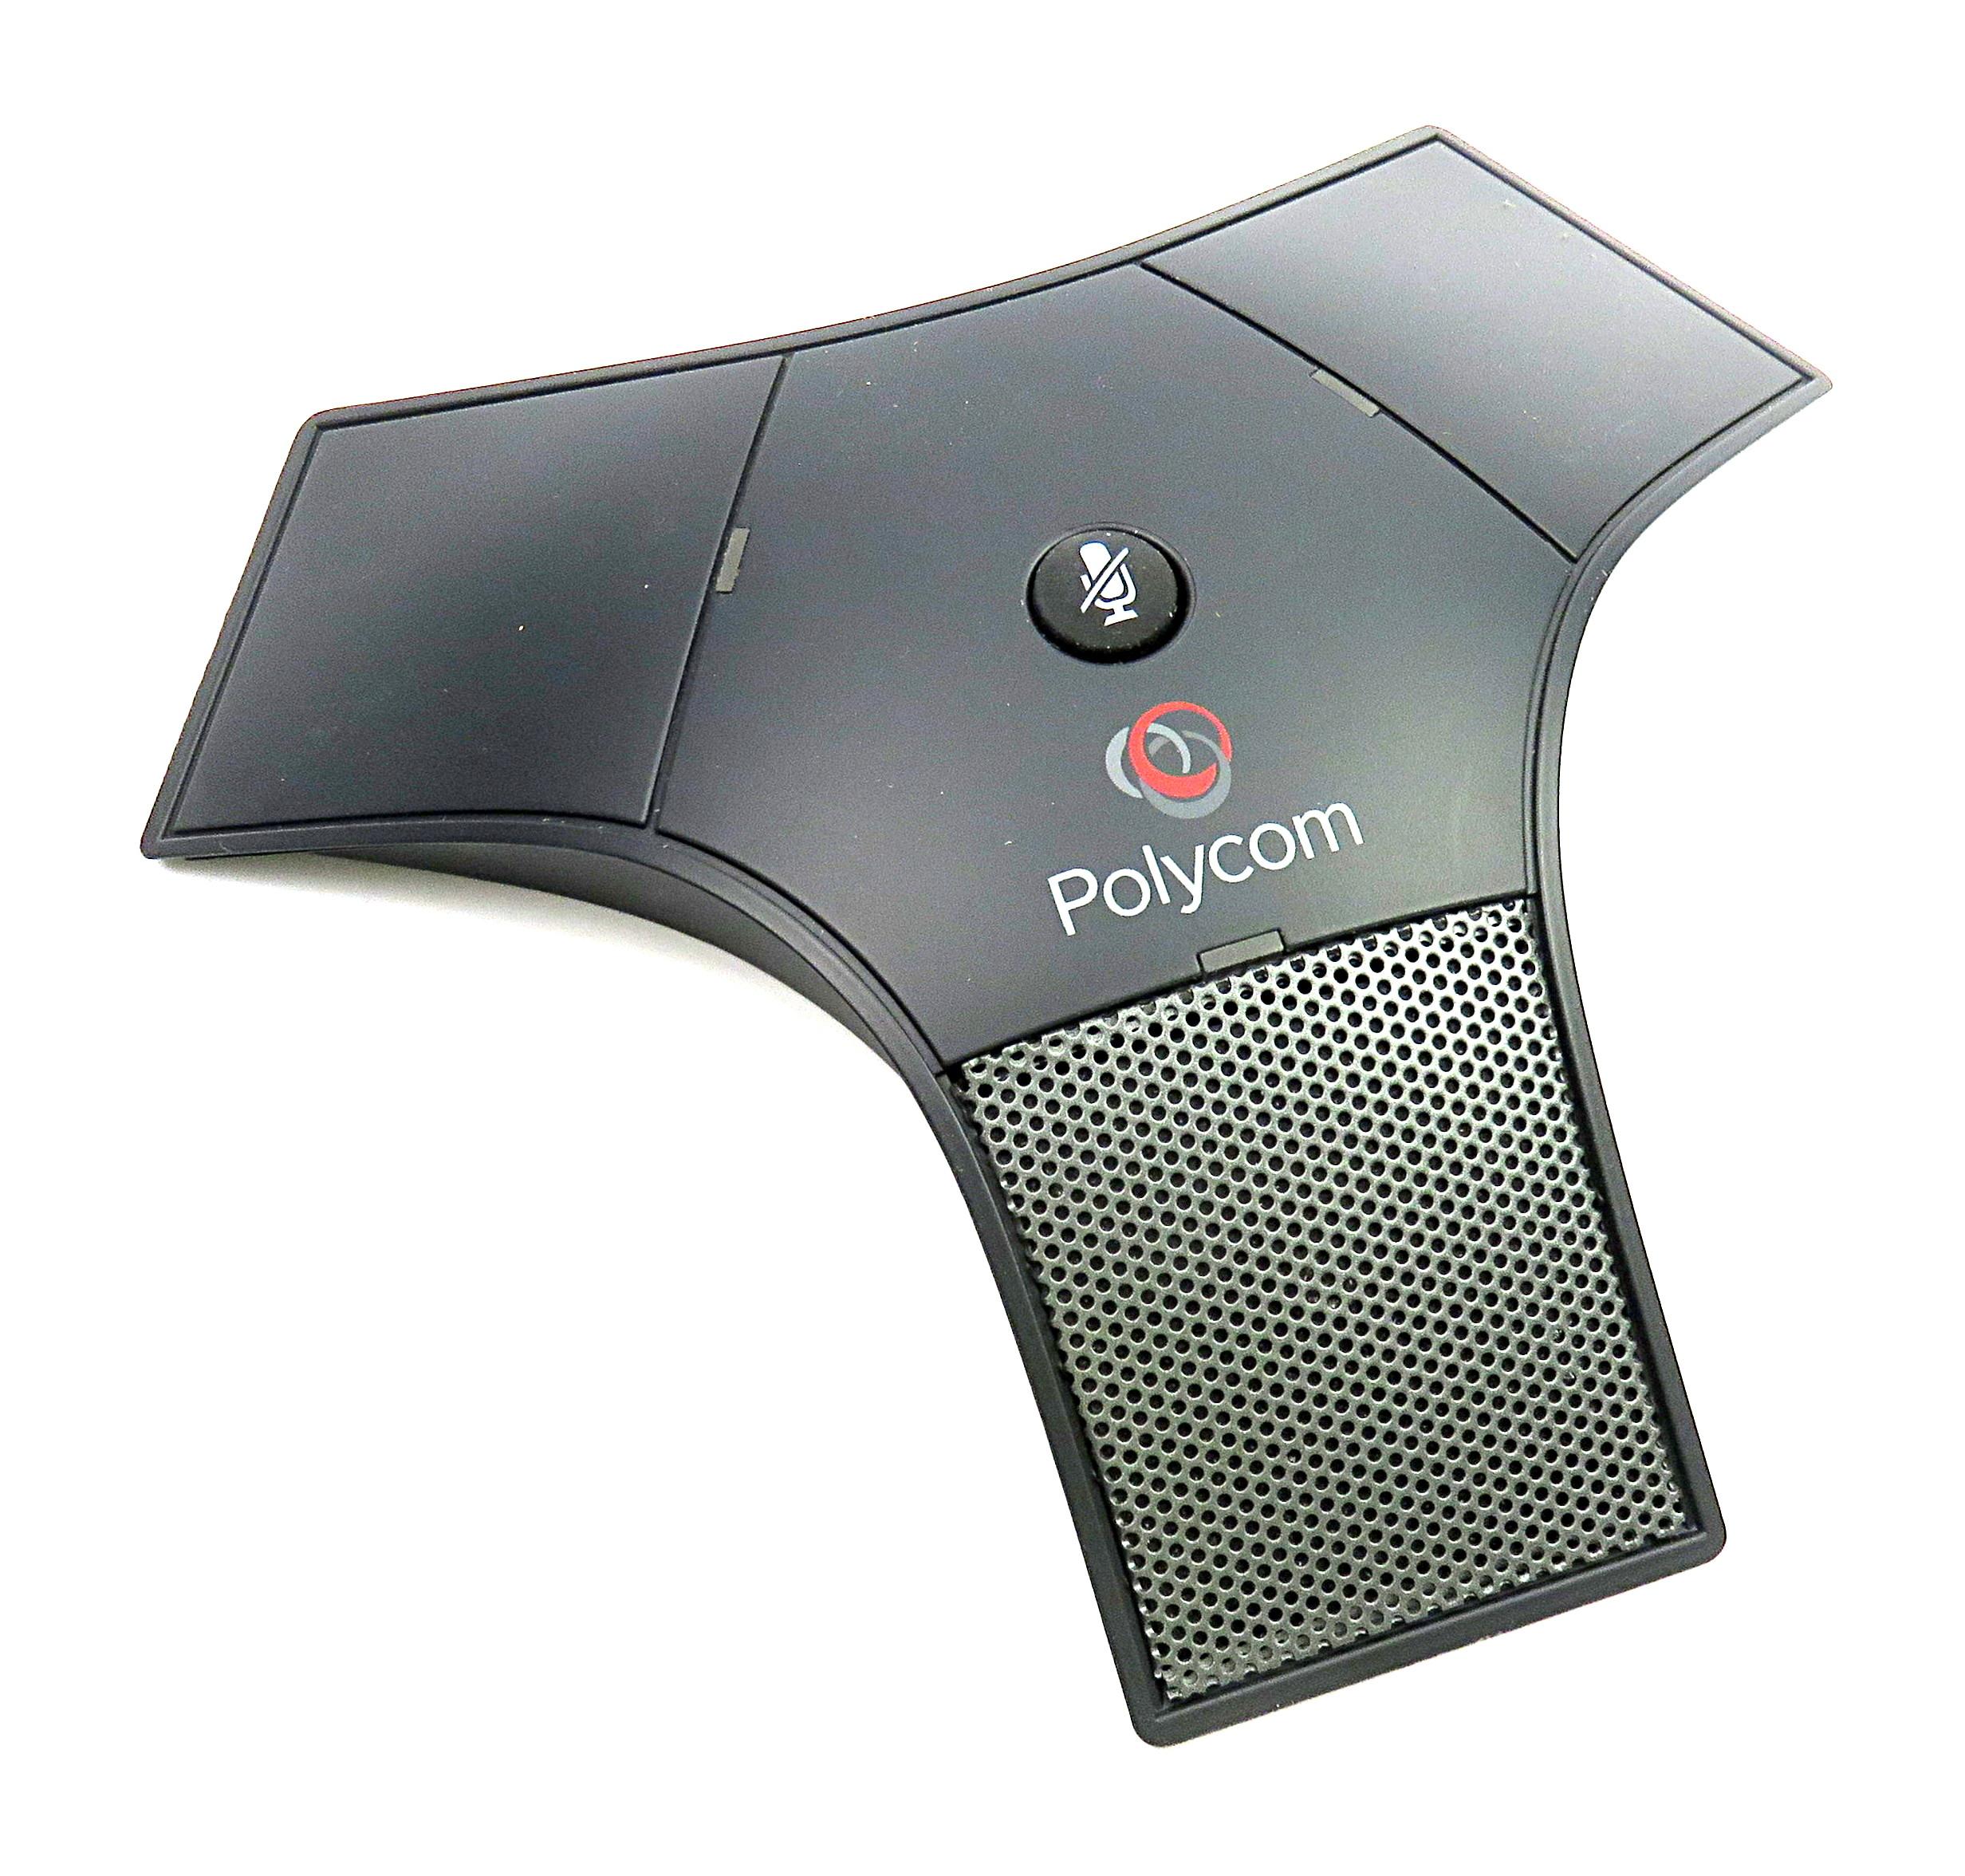 Polycom SoundStation IP 7000 Extended Microphone 2201-40040-001